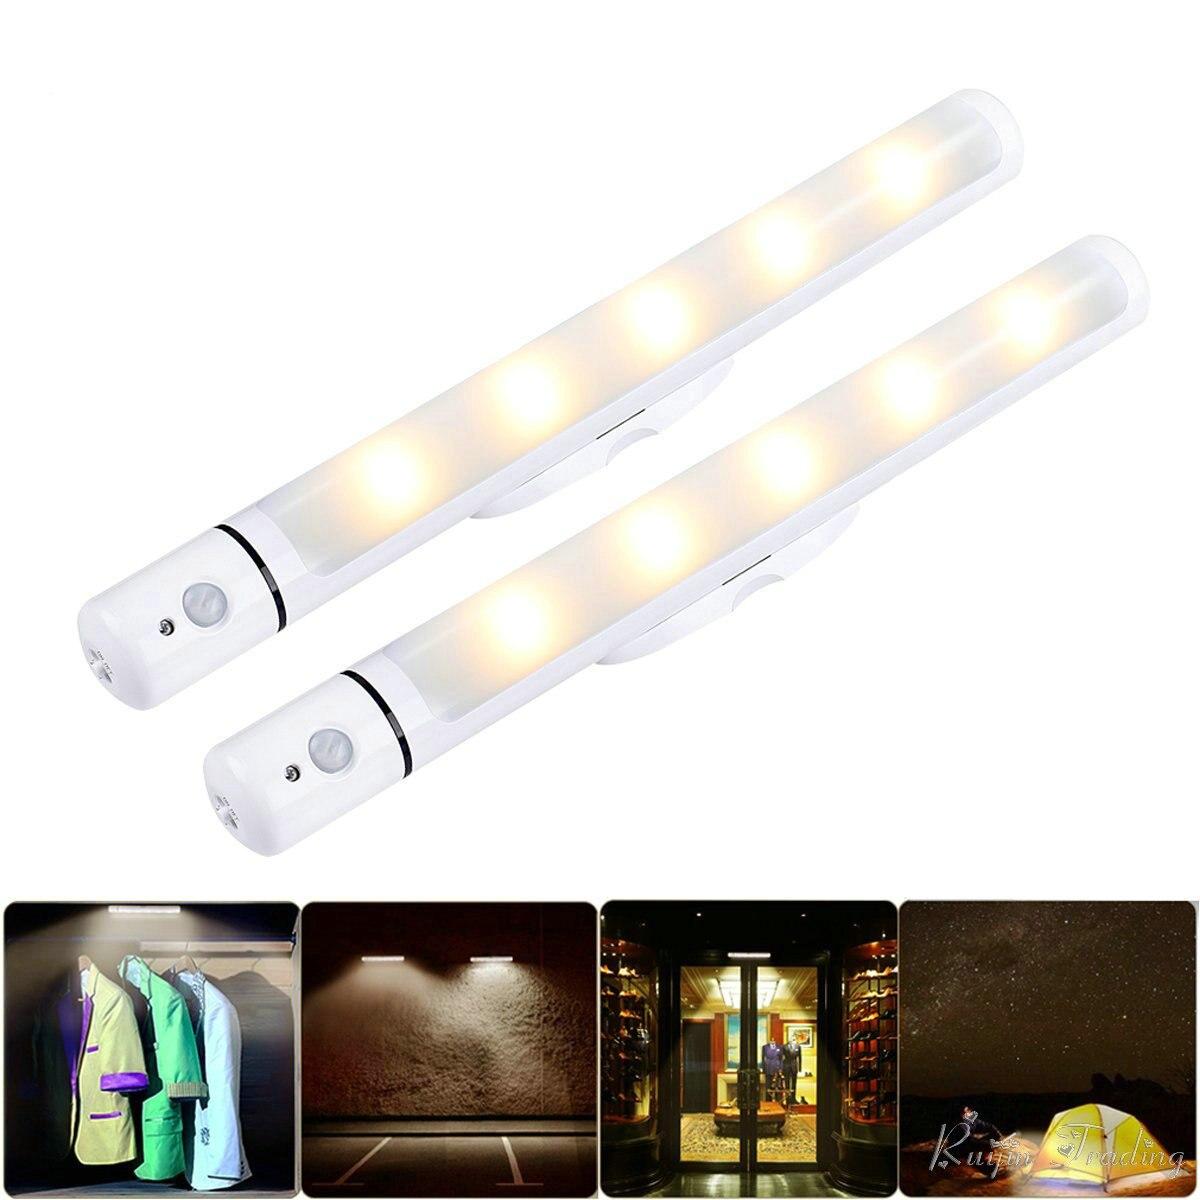 Drahtlose Batterie Betrieben Licht Camping LED Kast Küche Schrank Garage Treppen Notfall Closet Lampe Taschenlampe Wand Nacht